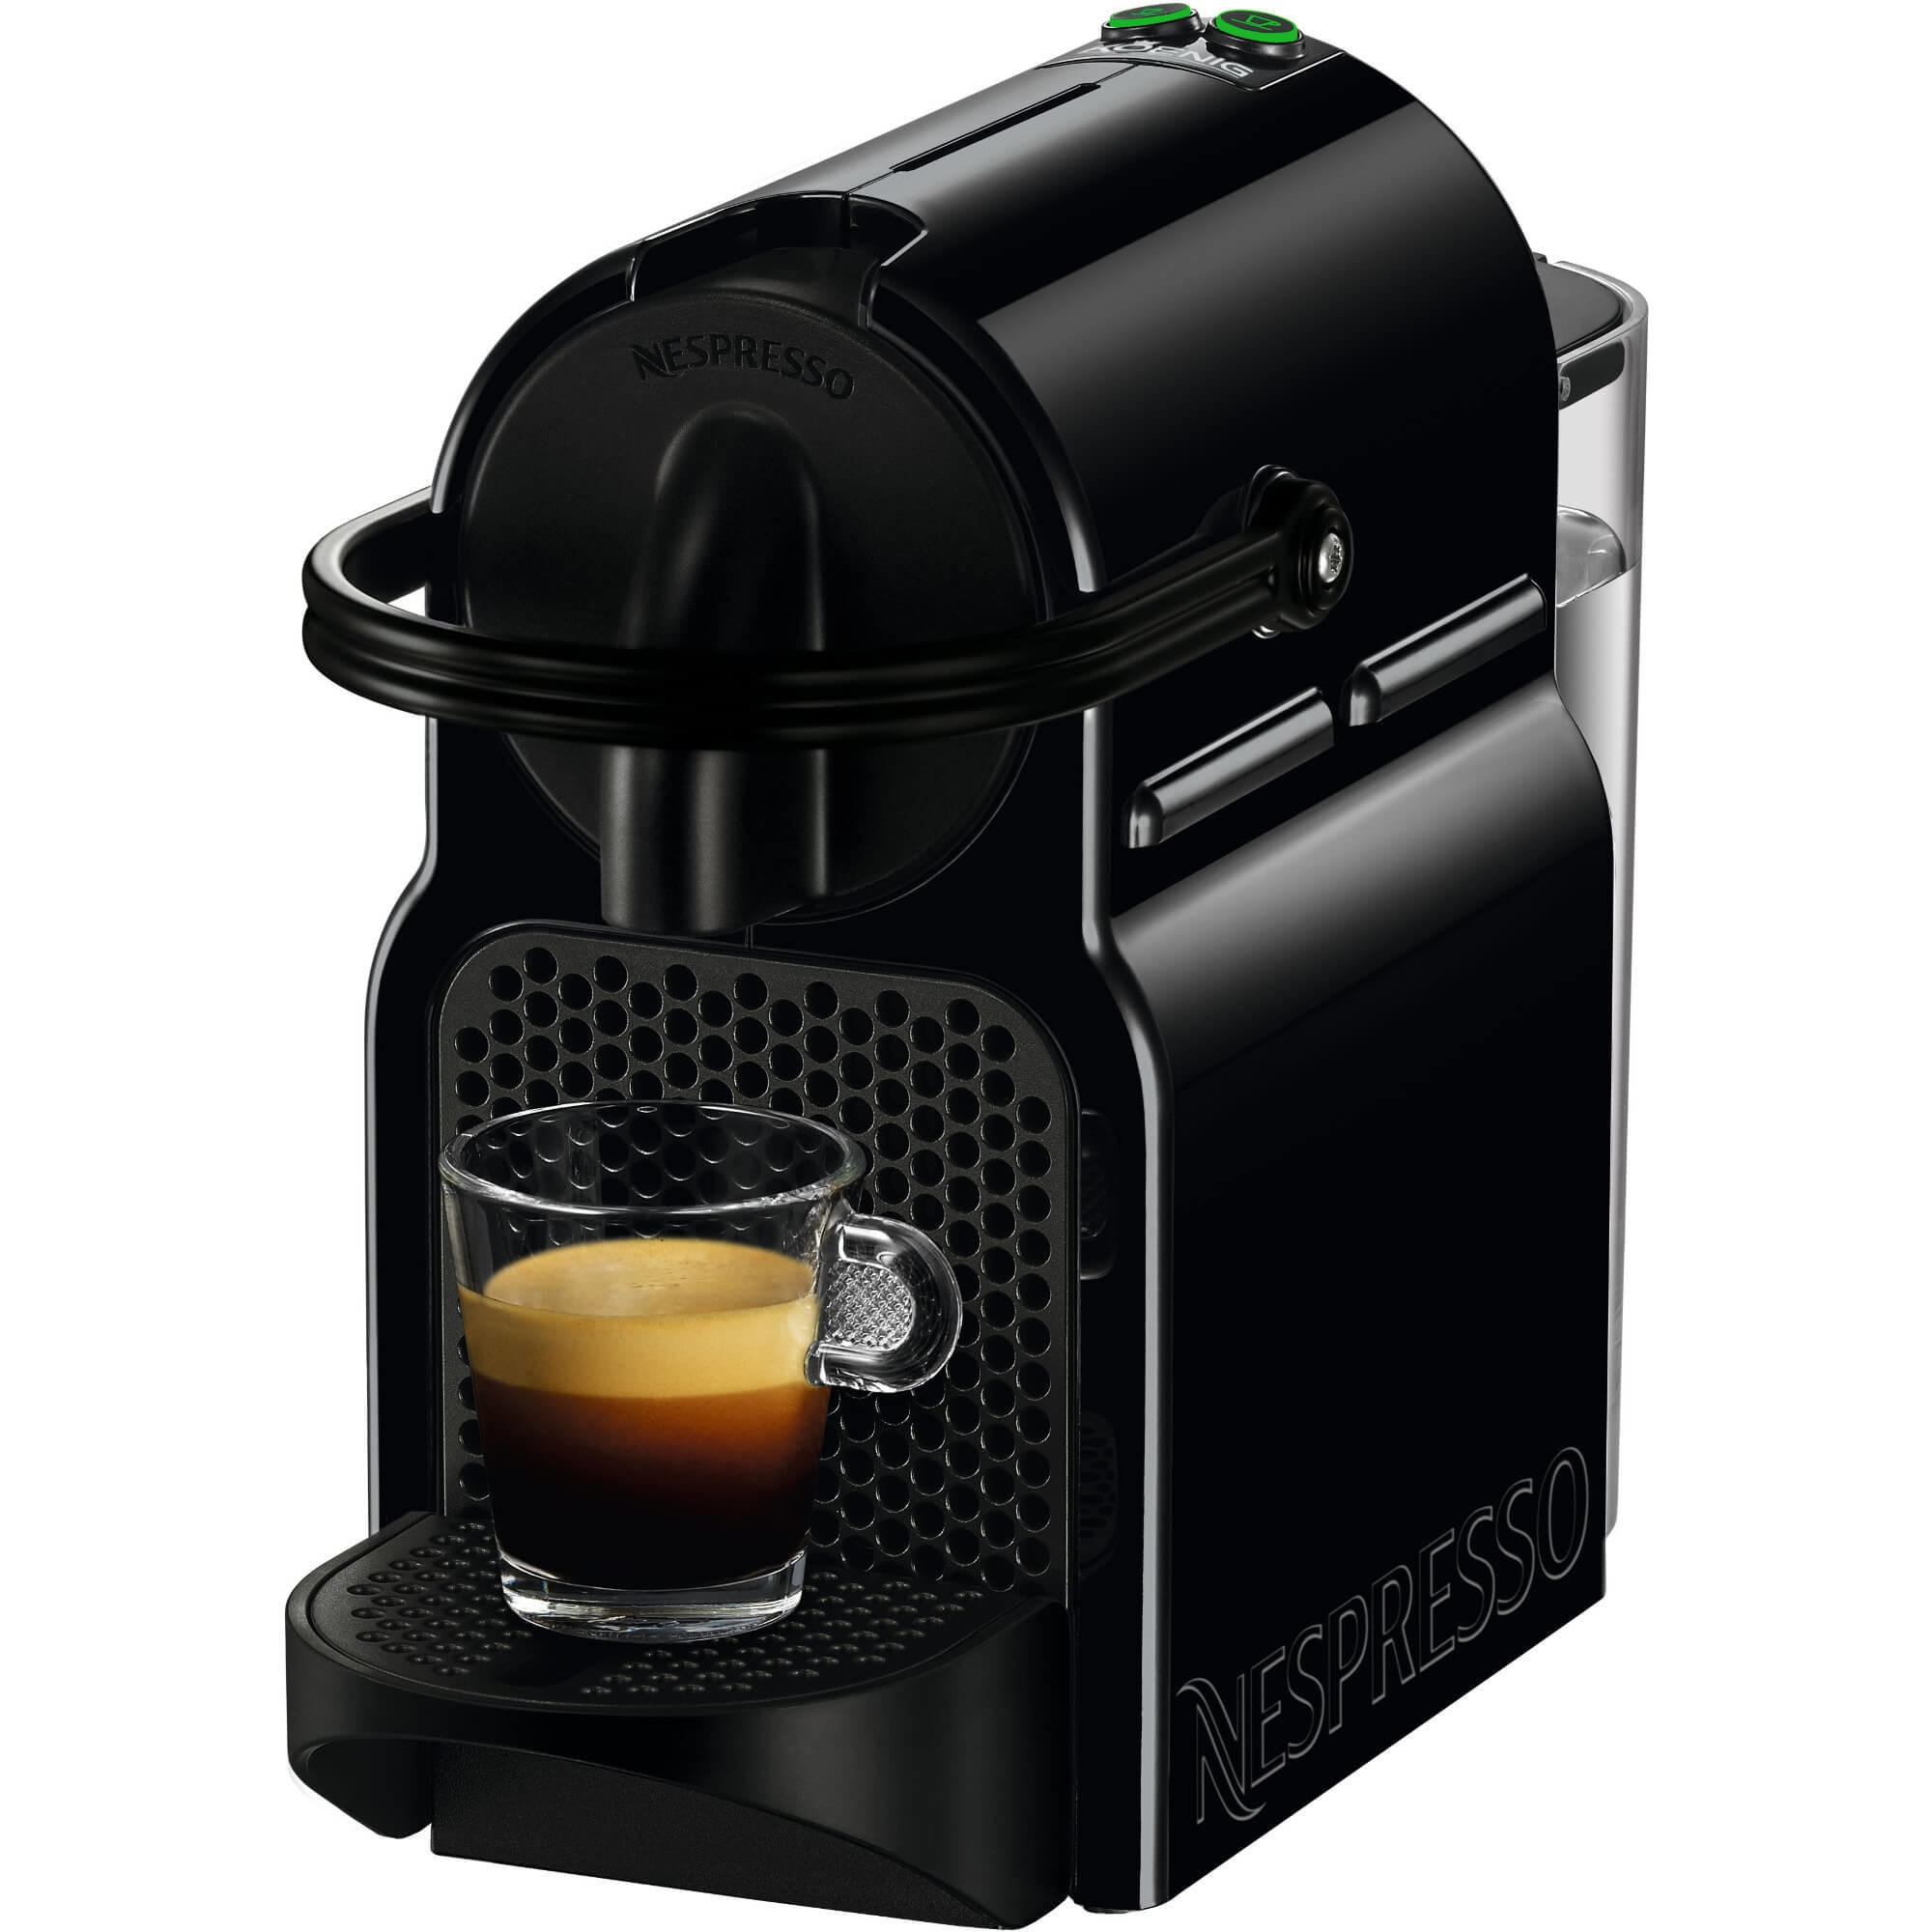 Fotografie Espressor Nespresso by De'Longhi Inissia Black, 19 bari, 1260 W, 0.7 l, Negru + 14 capsule cadou